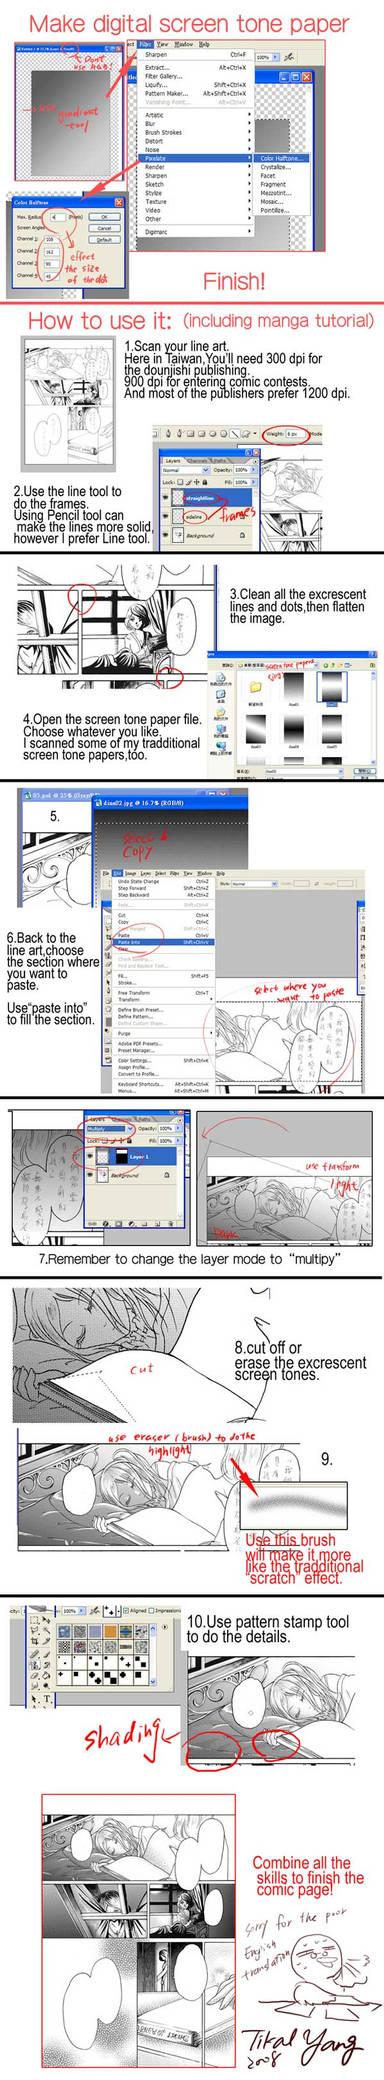 Screen tone paper tutorial2